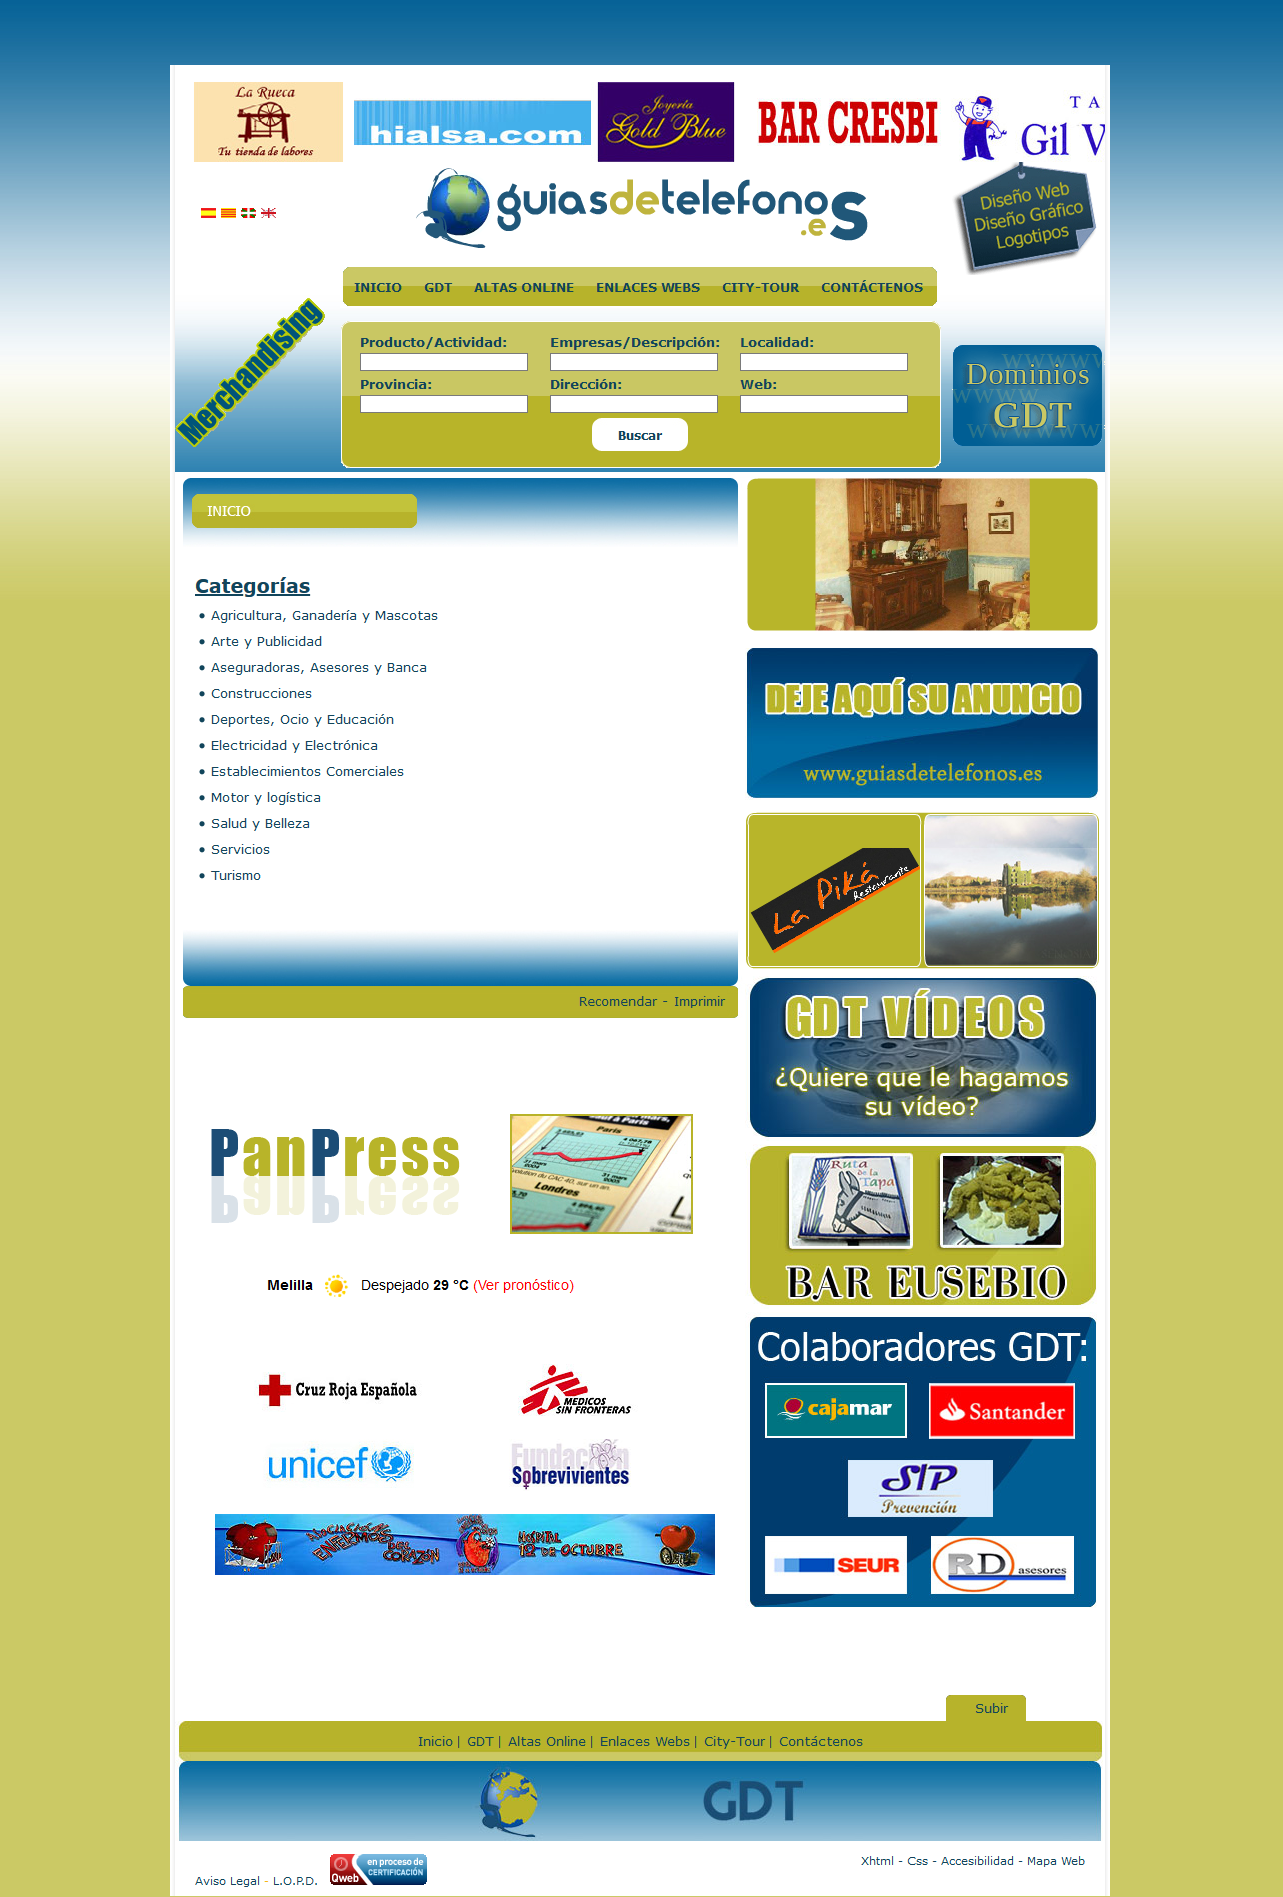 Guías de Teléfonos .es - Guía telefónica de empresas - Php, Mysql, Javascript, XHTML 1.0 Strict, CSS, Accesibilidad, Photoshop, Dreamweaver. Año 2008